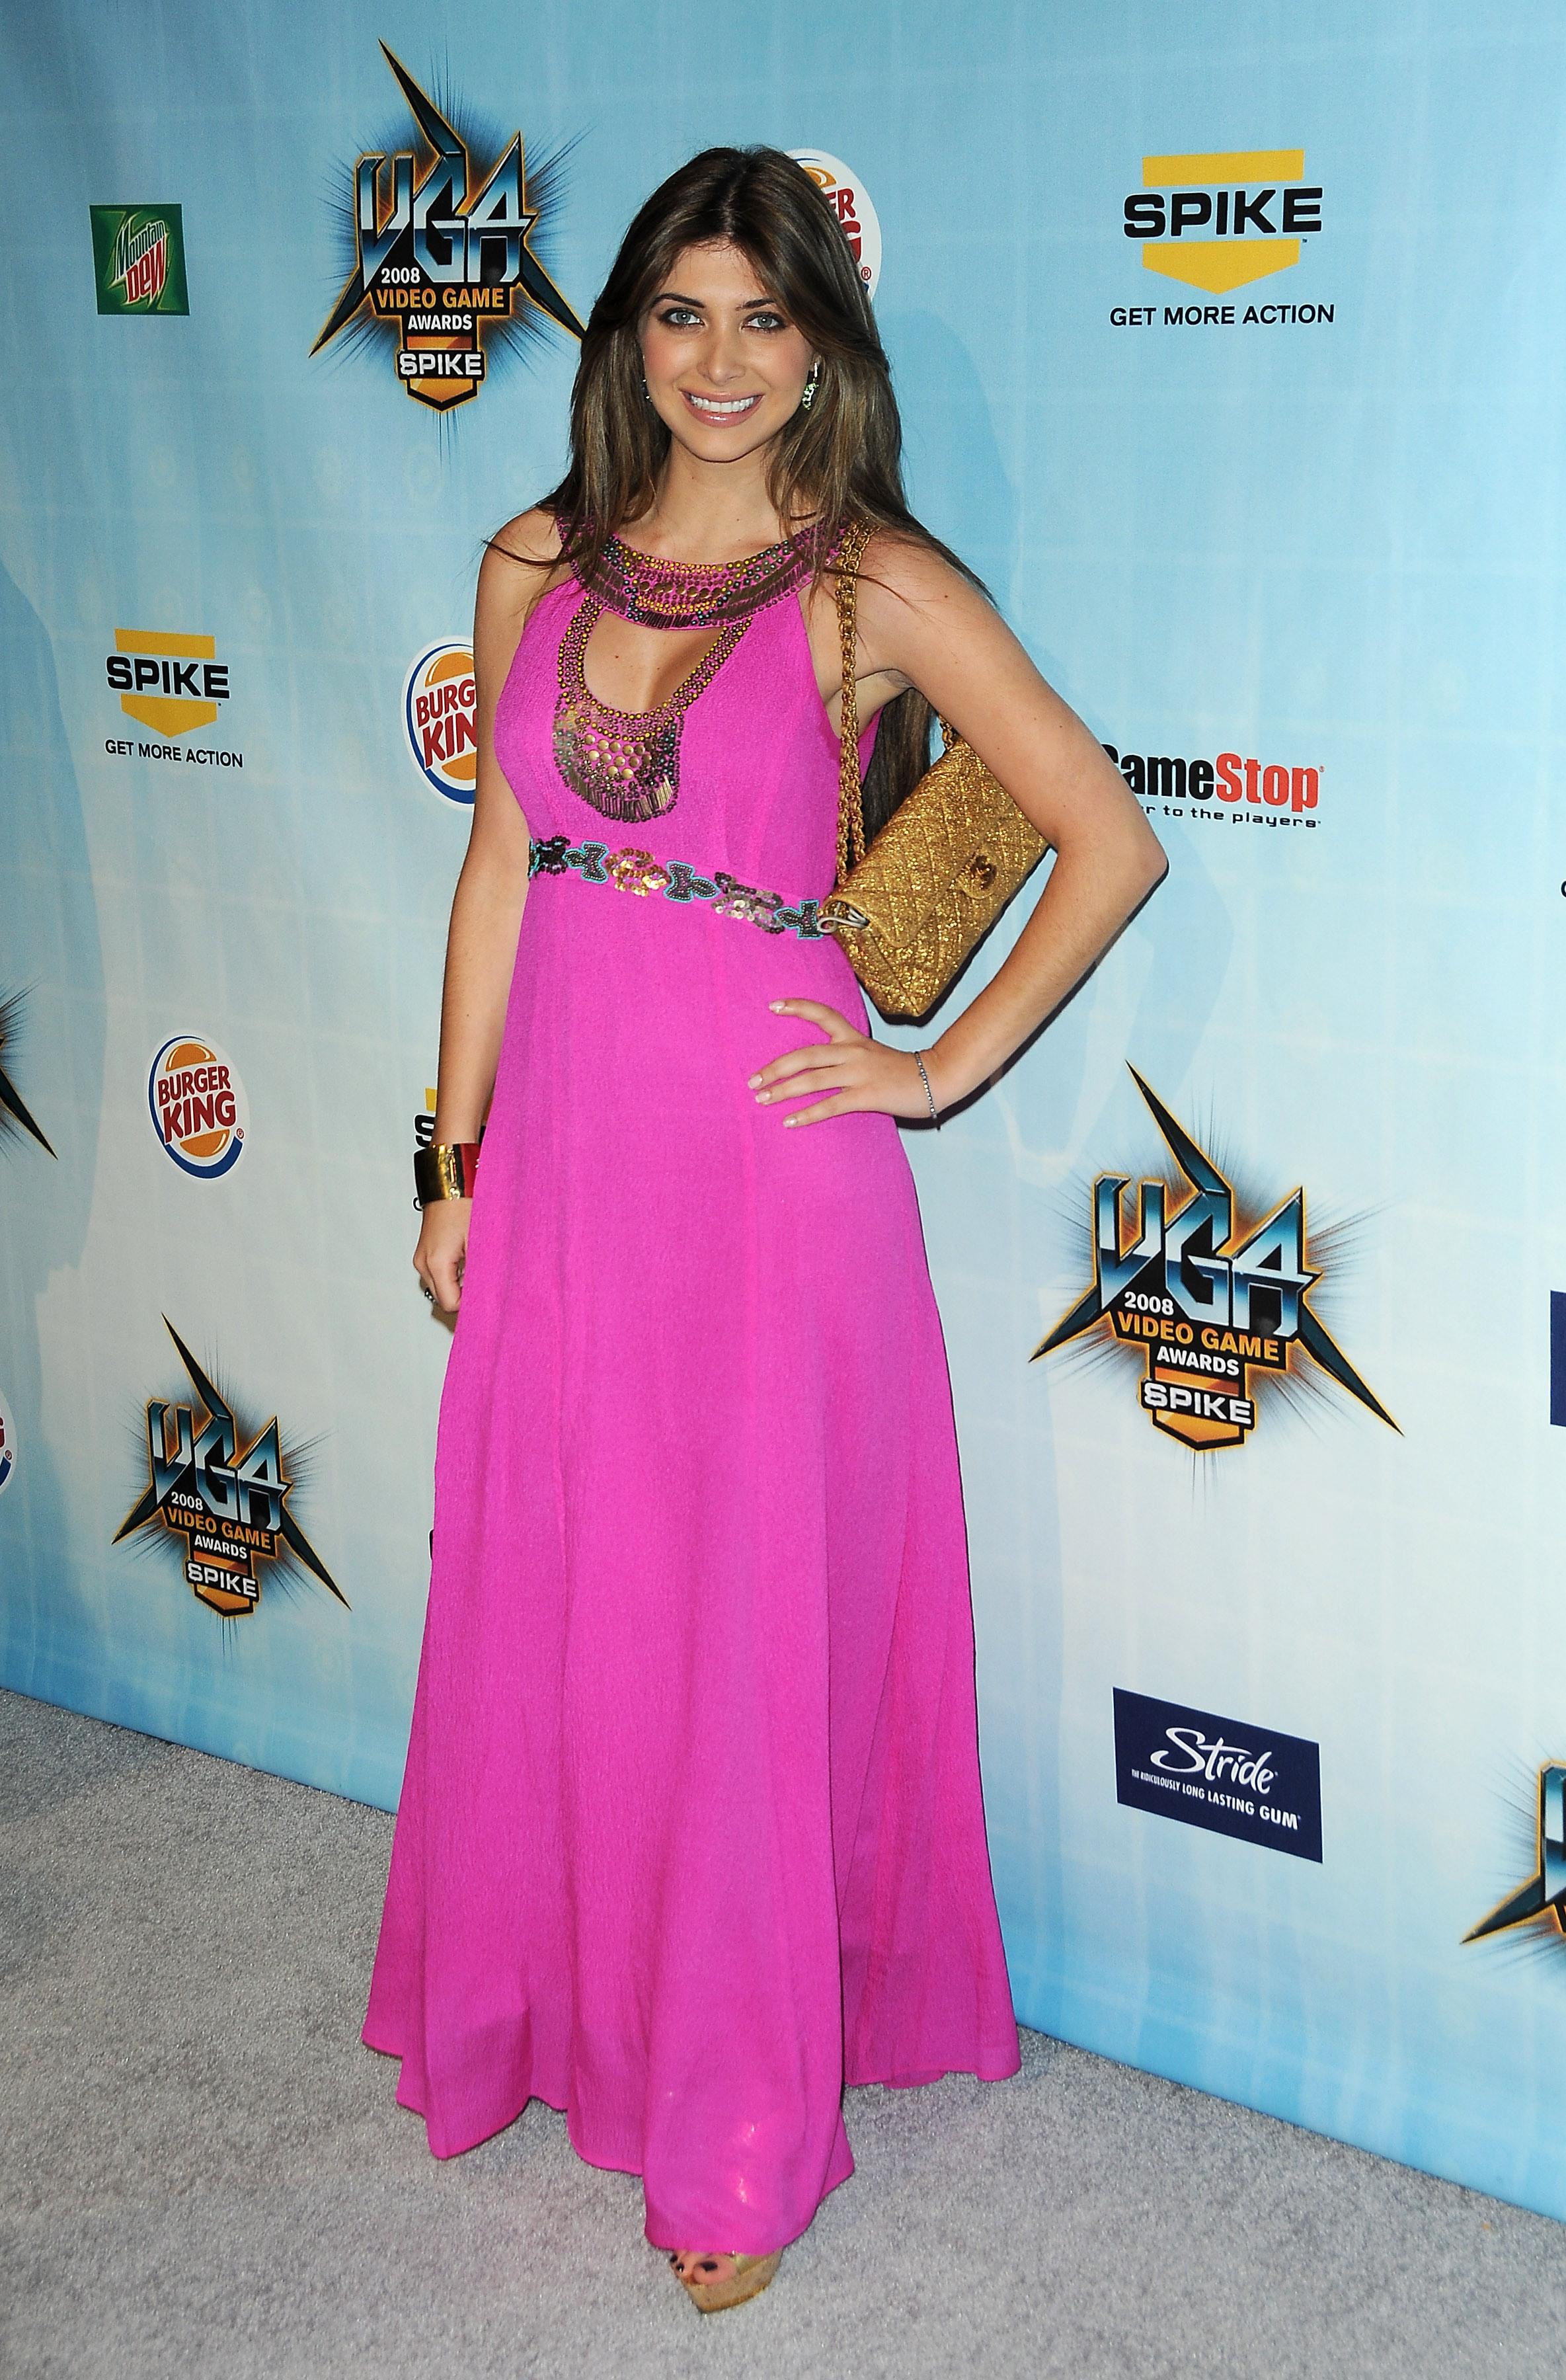 28649_Brittny_Gastineau_-_6th_annual_Video_Game_Awards_CU_ISA_04_122_644lo.jpg